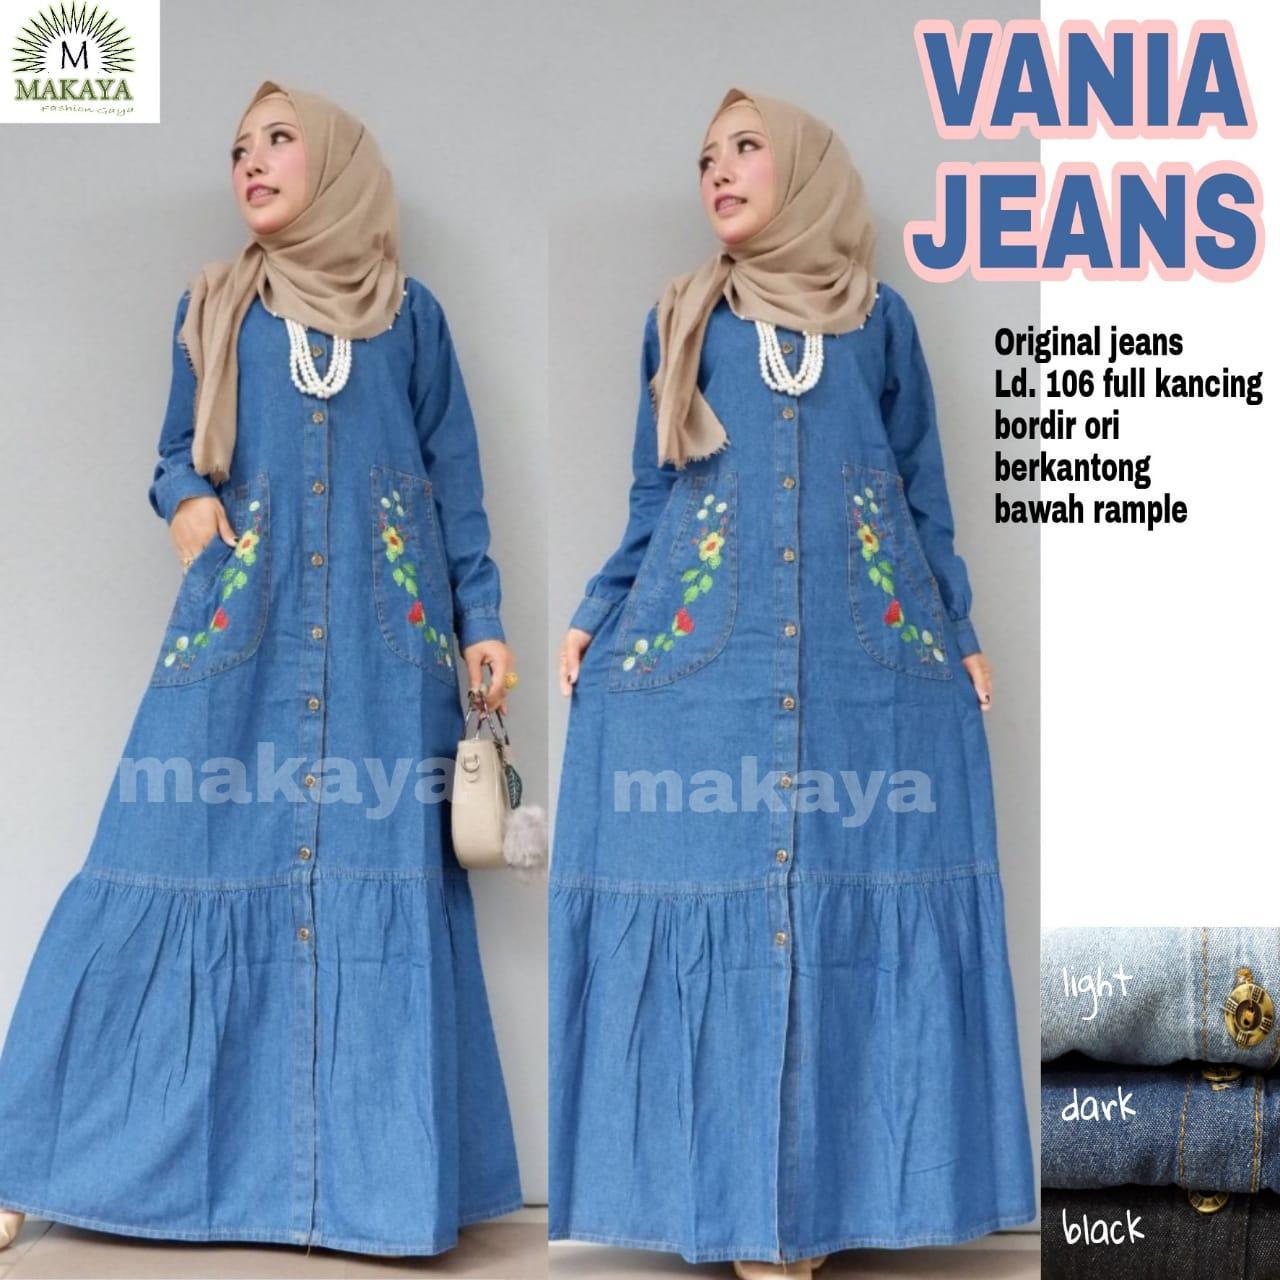 Gamis Jeans Vania - Baju Muslim - Maxy Dress - Gamis Jeans Wash - Gamis  Model 5cbd16abef